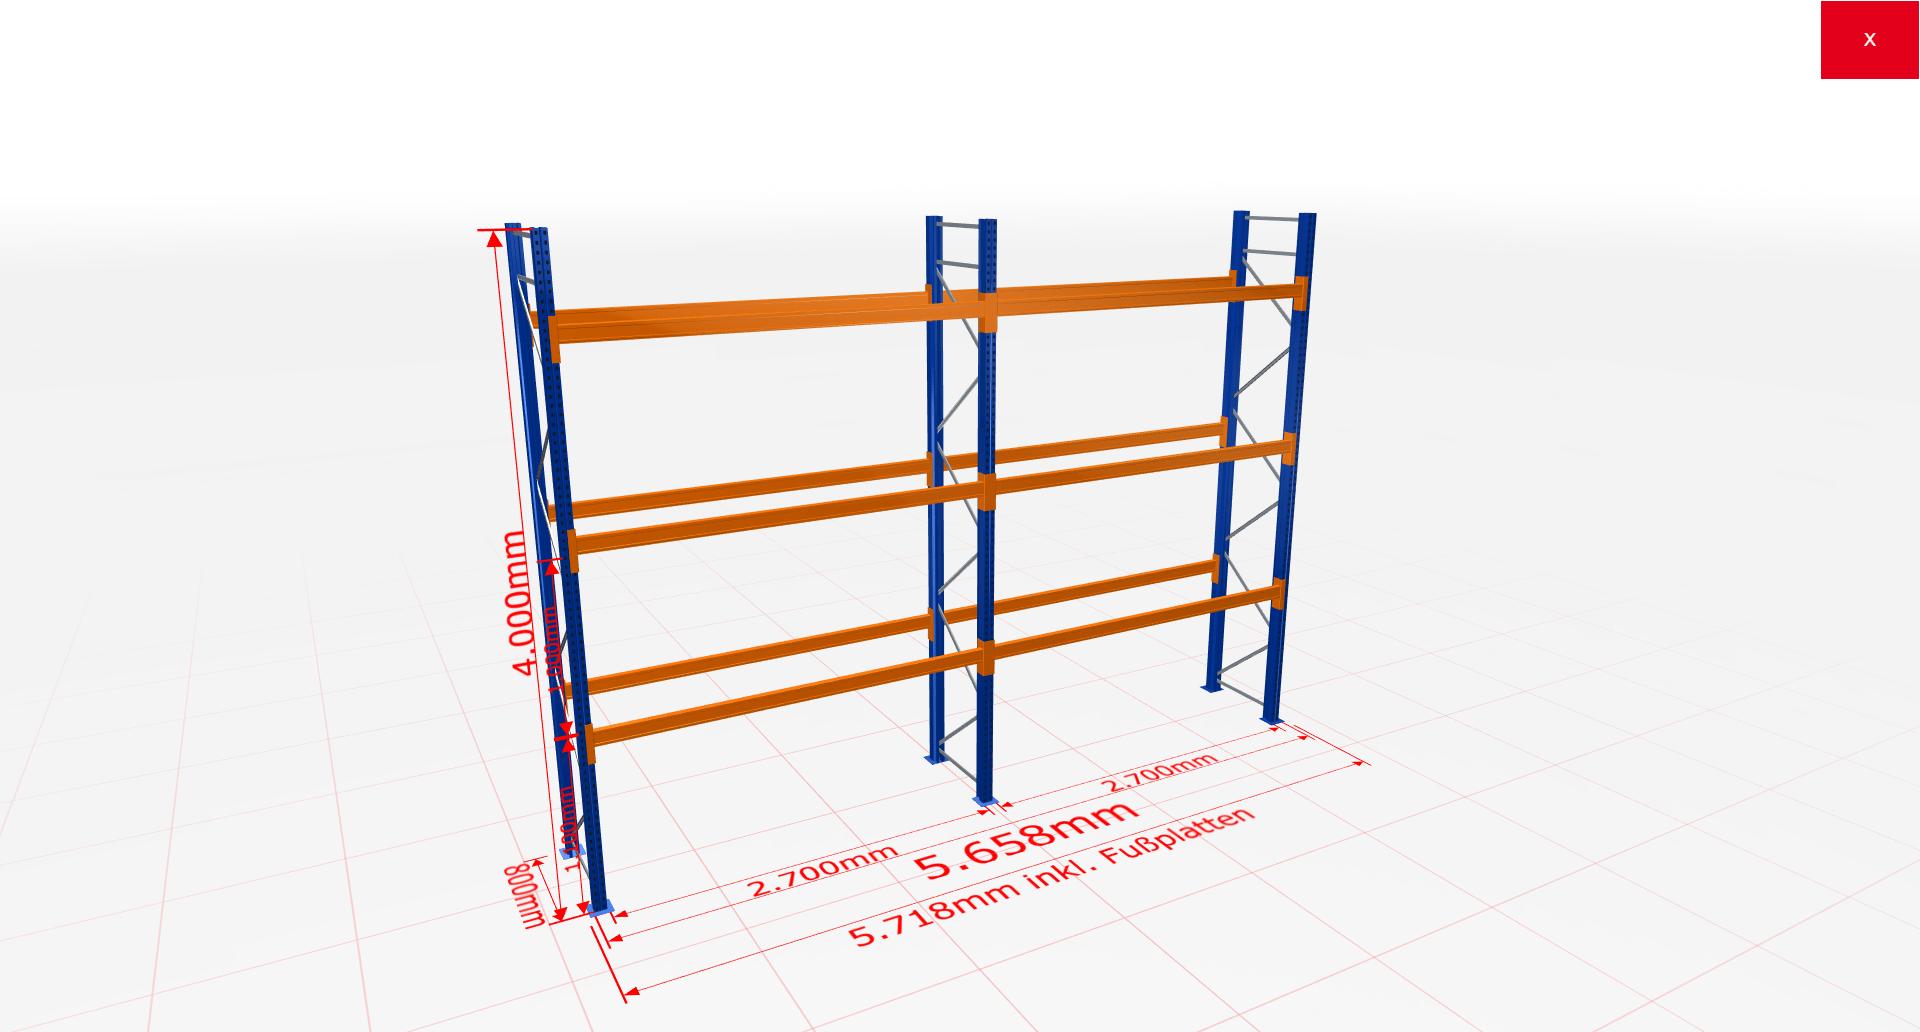 Palettenregal Komplettregal 4000x5658x800 mm (HxBxT) 3 Fachebenen SCHULTE Lagertechnik